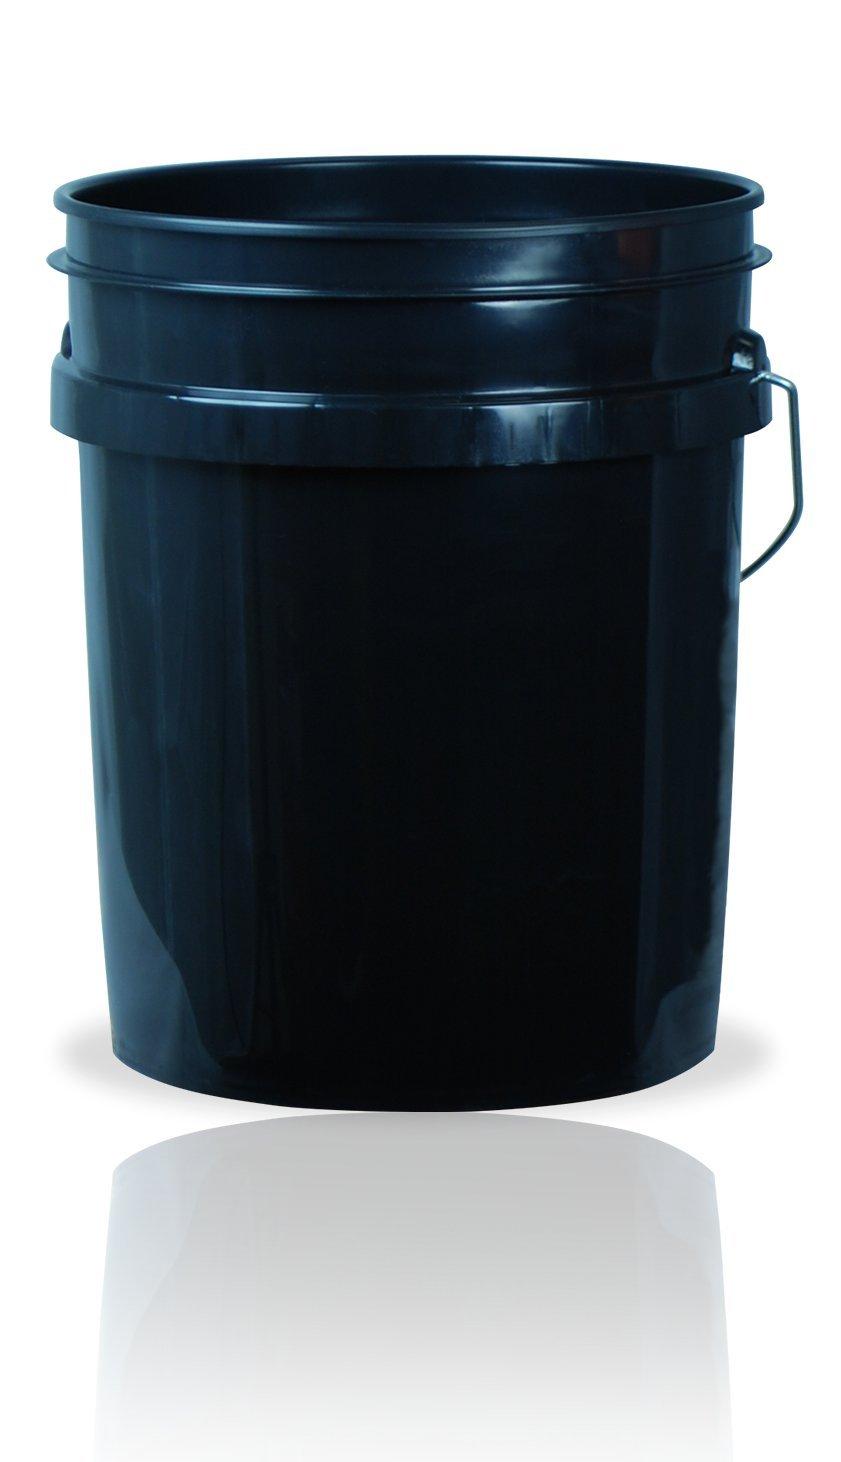 5 Gallon (20L) Plastic Buckets, 3-Pack - Black